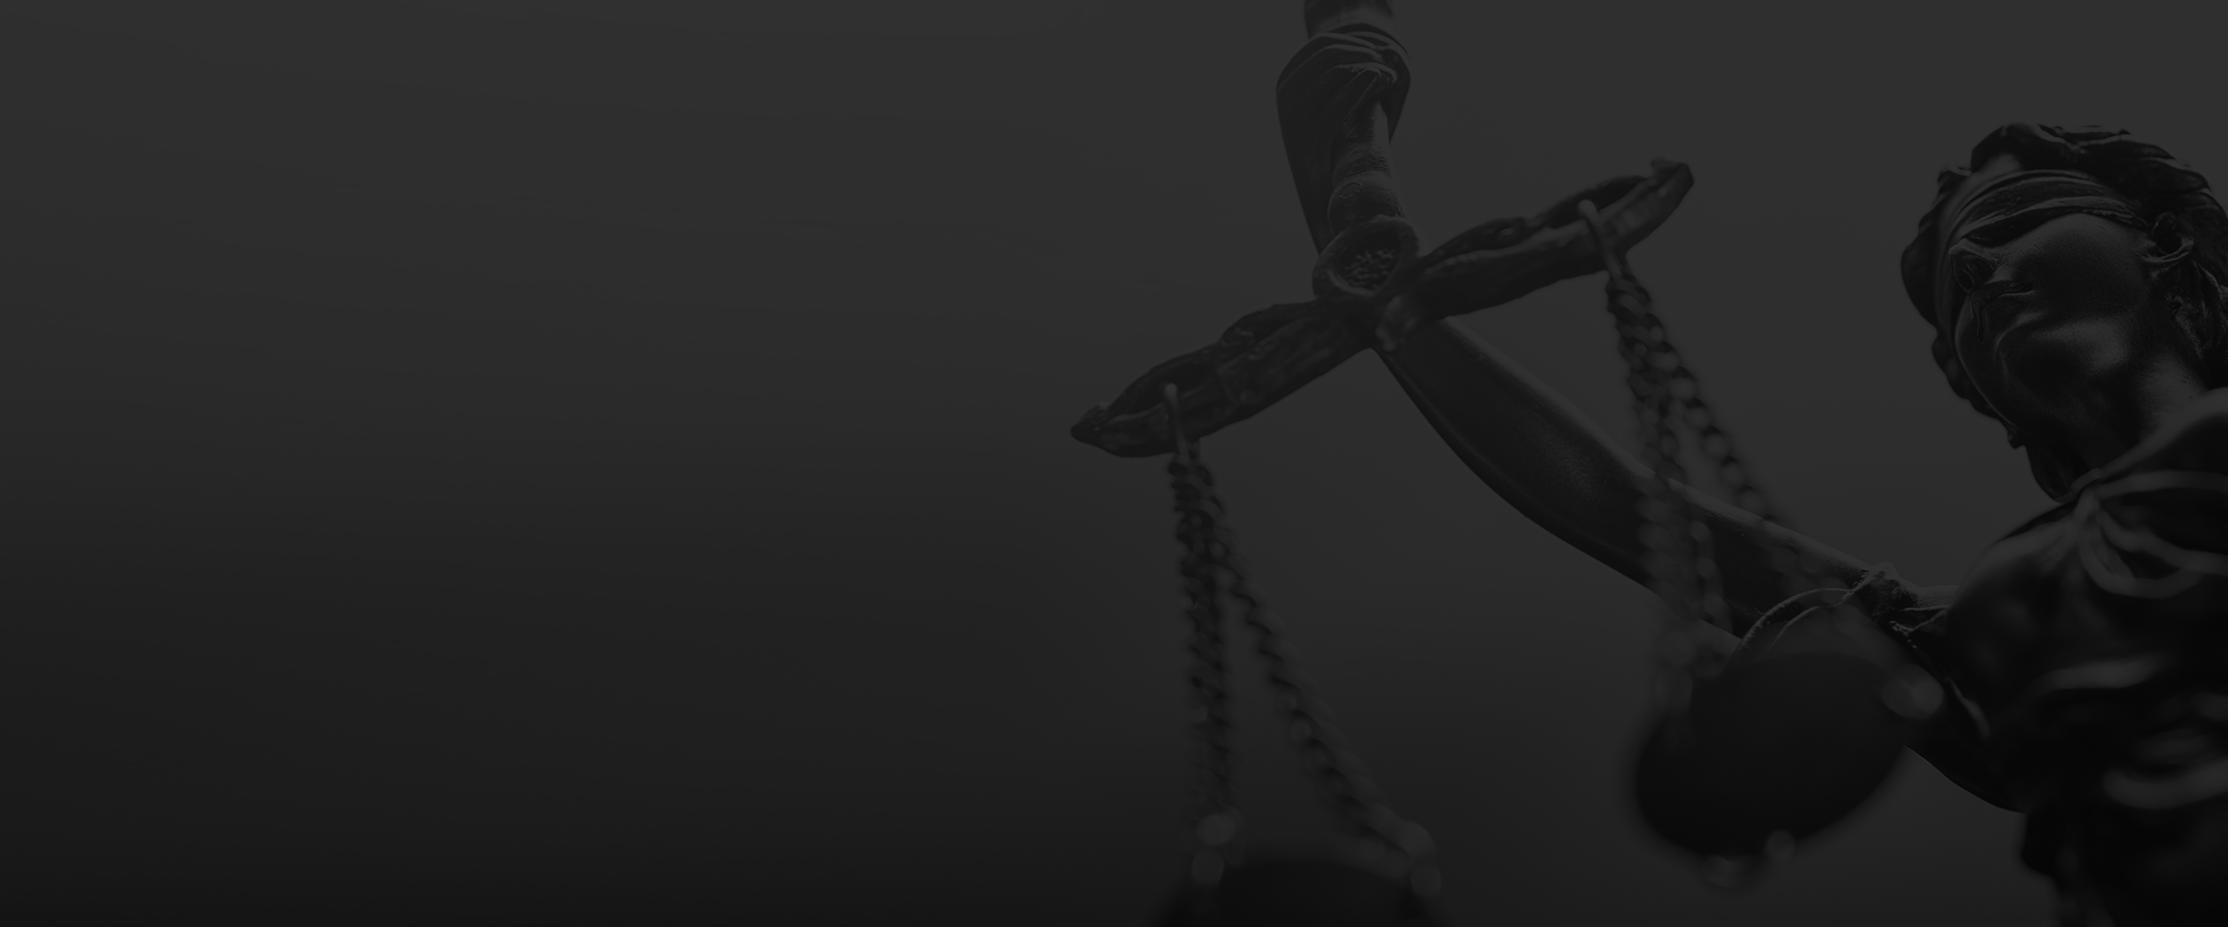 scales of justice, darkened